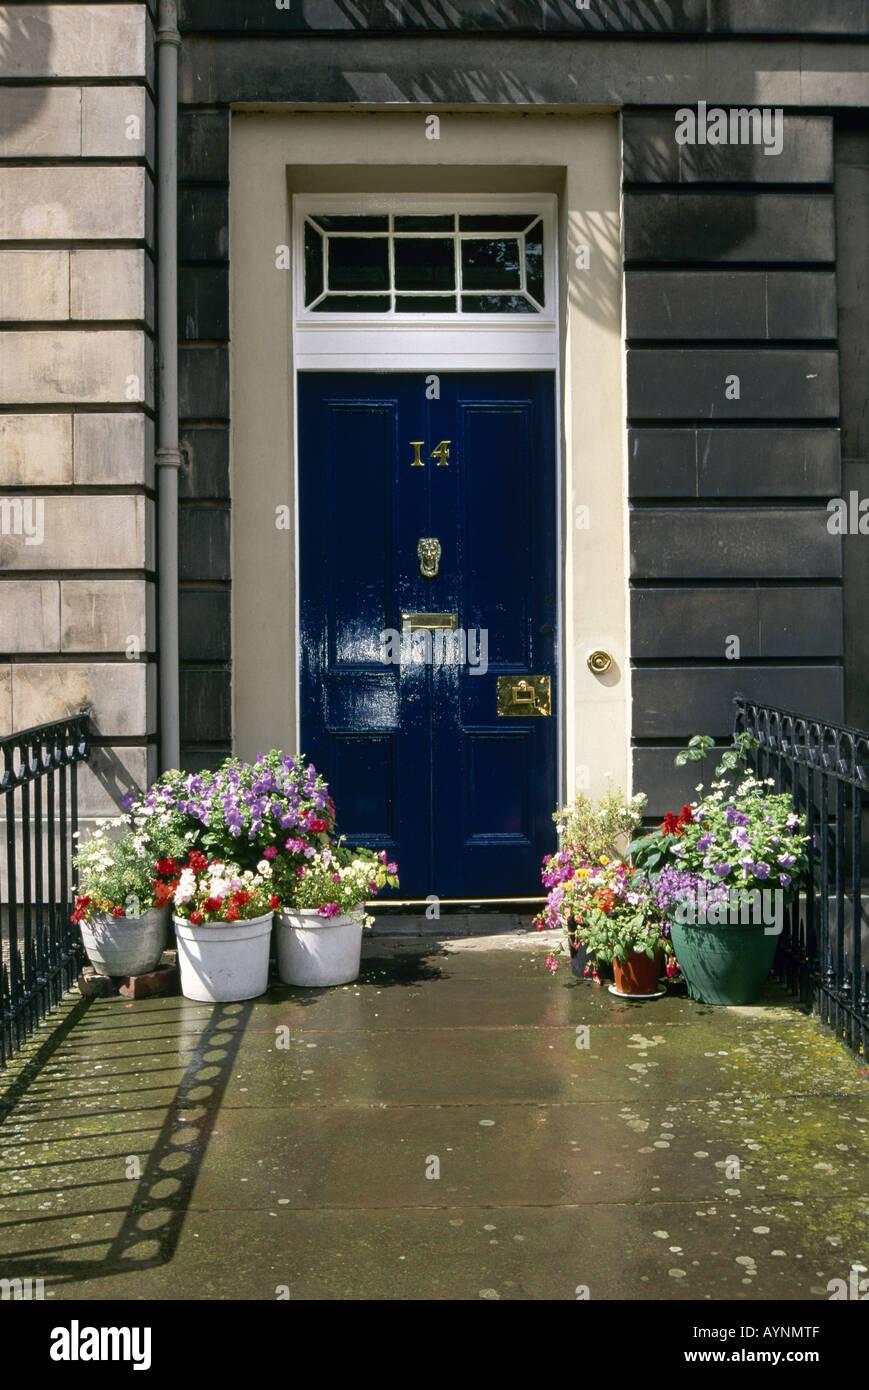 El Azul De La Puerta Frontal Del Número 14 Dean Terraza